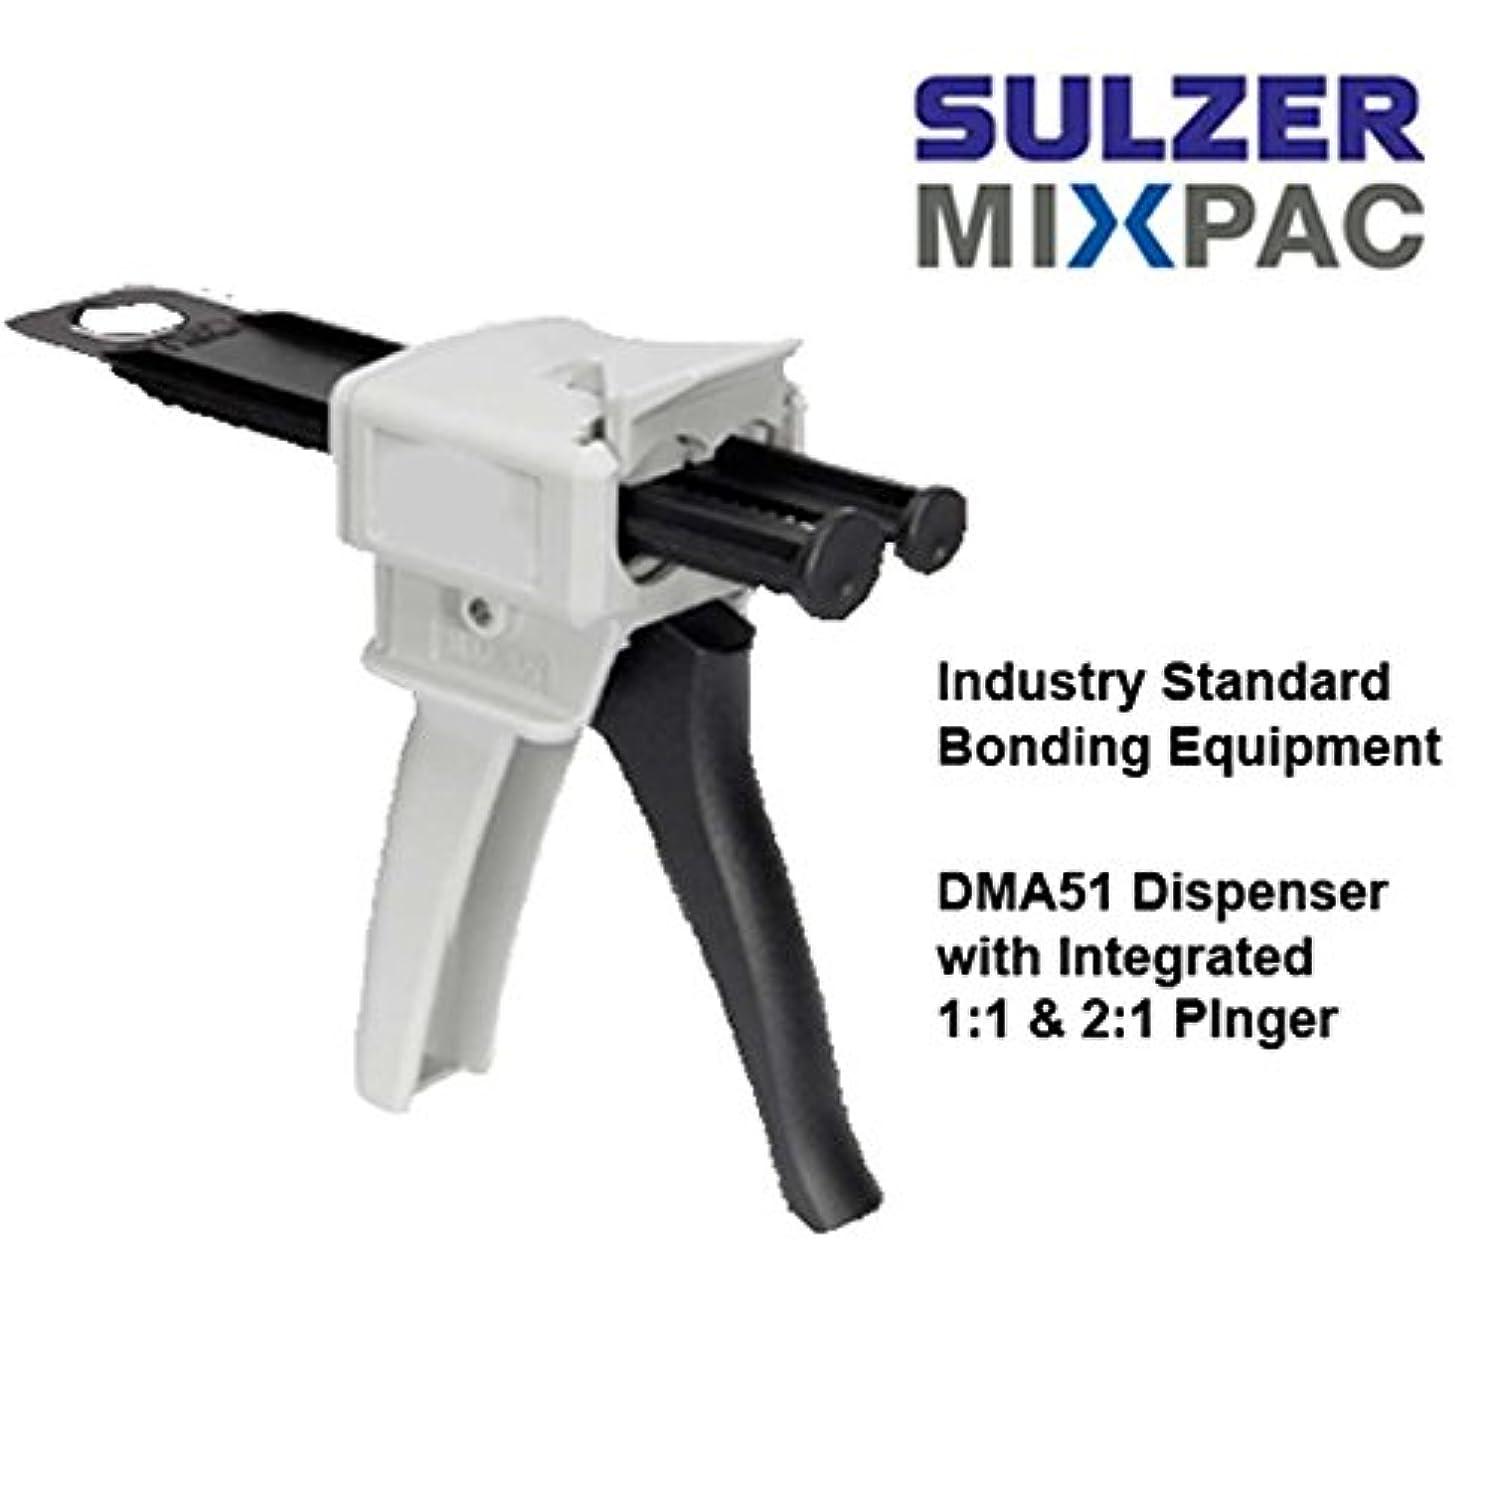 MixPac DMA51 Dispenser Kit for 50ml/1.7oz Epoxy & Adhesives (1:1 & 2:1 Ratios)